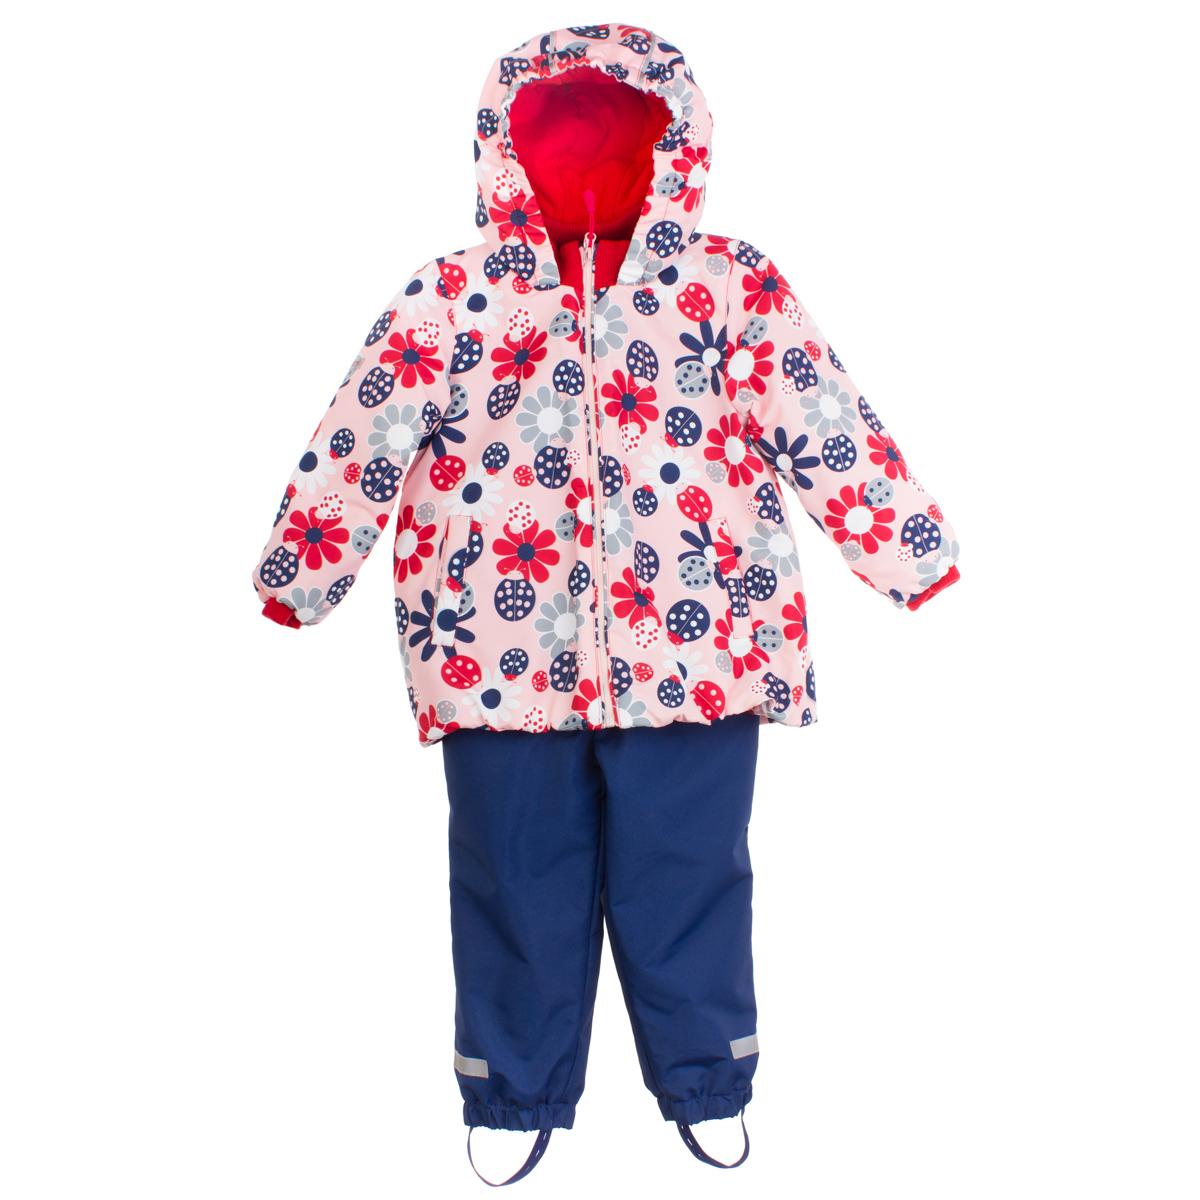 Комплект: куртка, полукомбинезон 168001